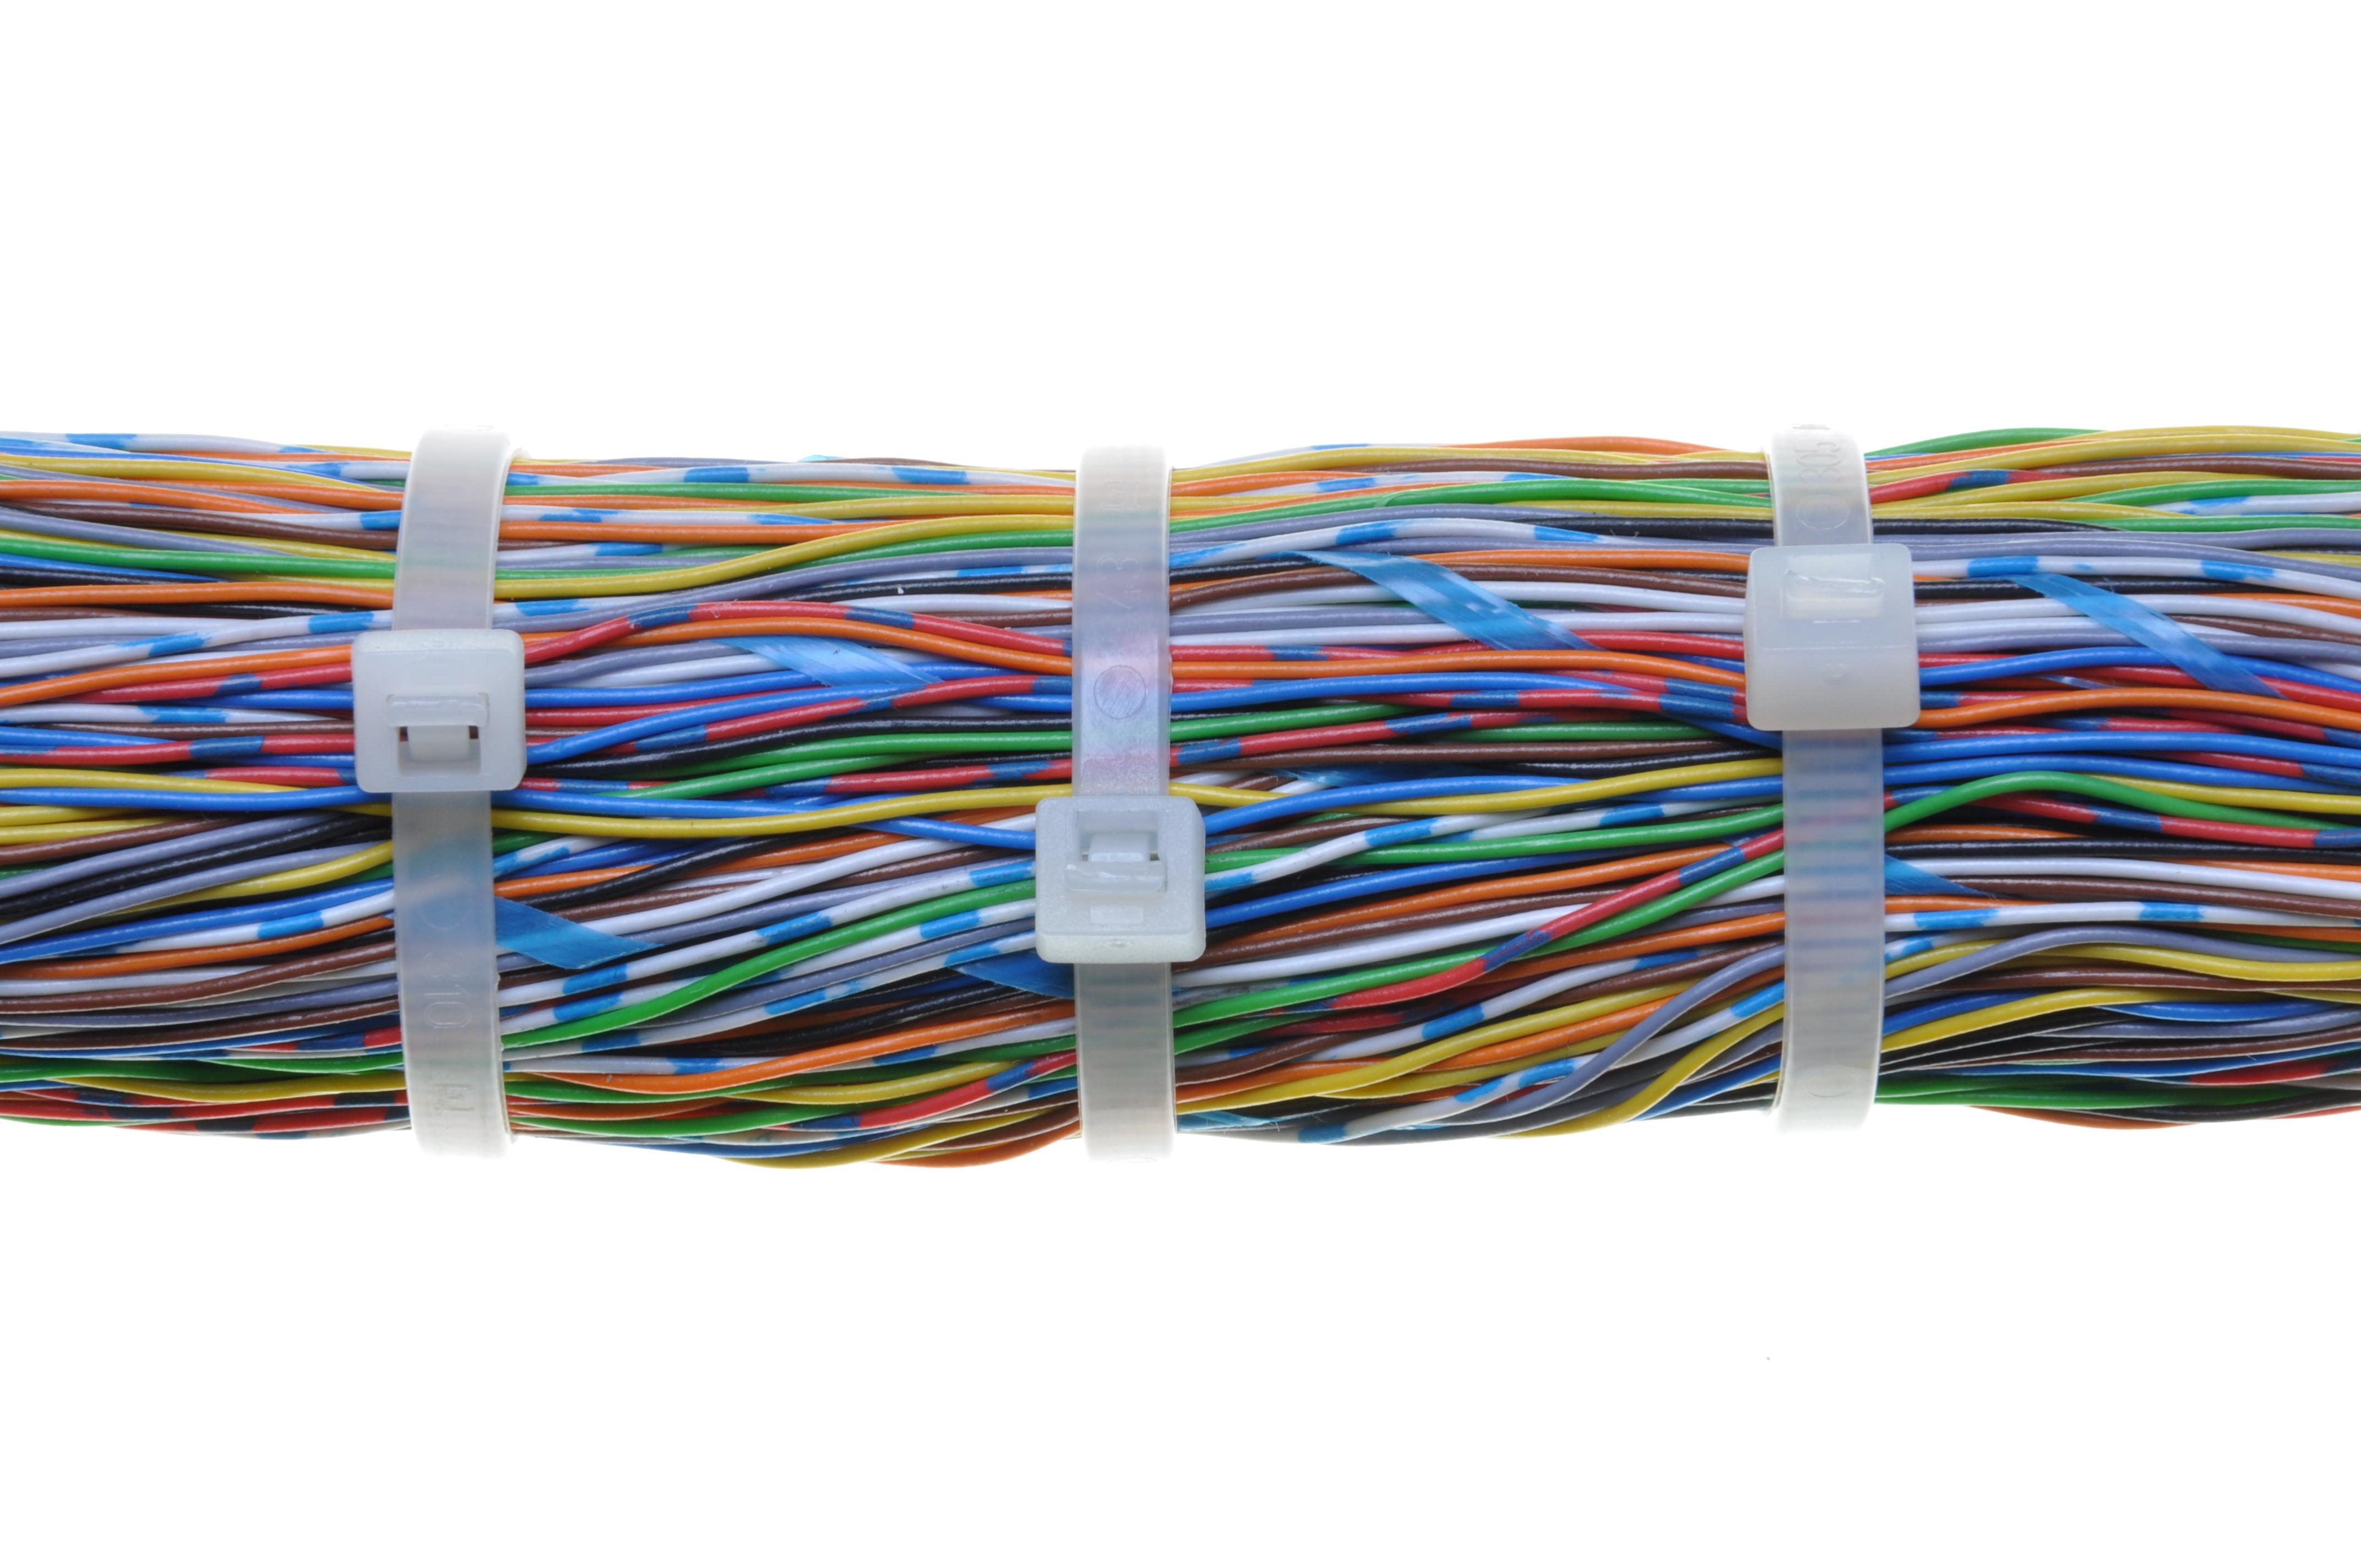 betts wiring harness mechanisms cable ties hackaday best wiring harness for 1967 camaro mechanisms cable ties hackaday